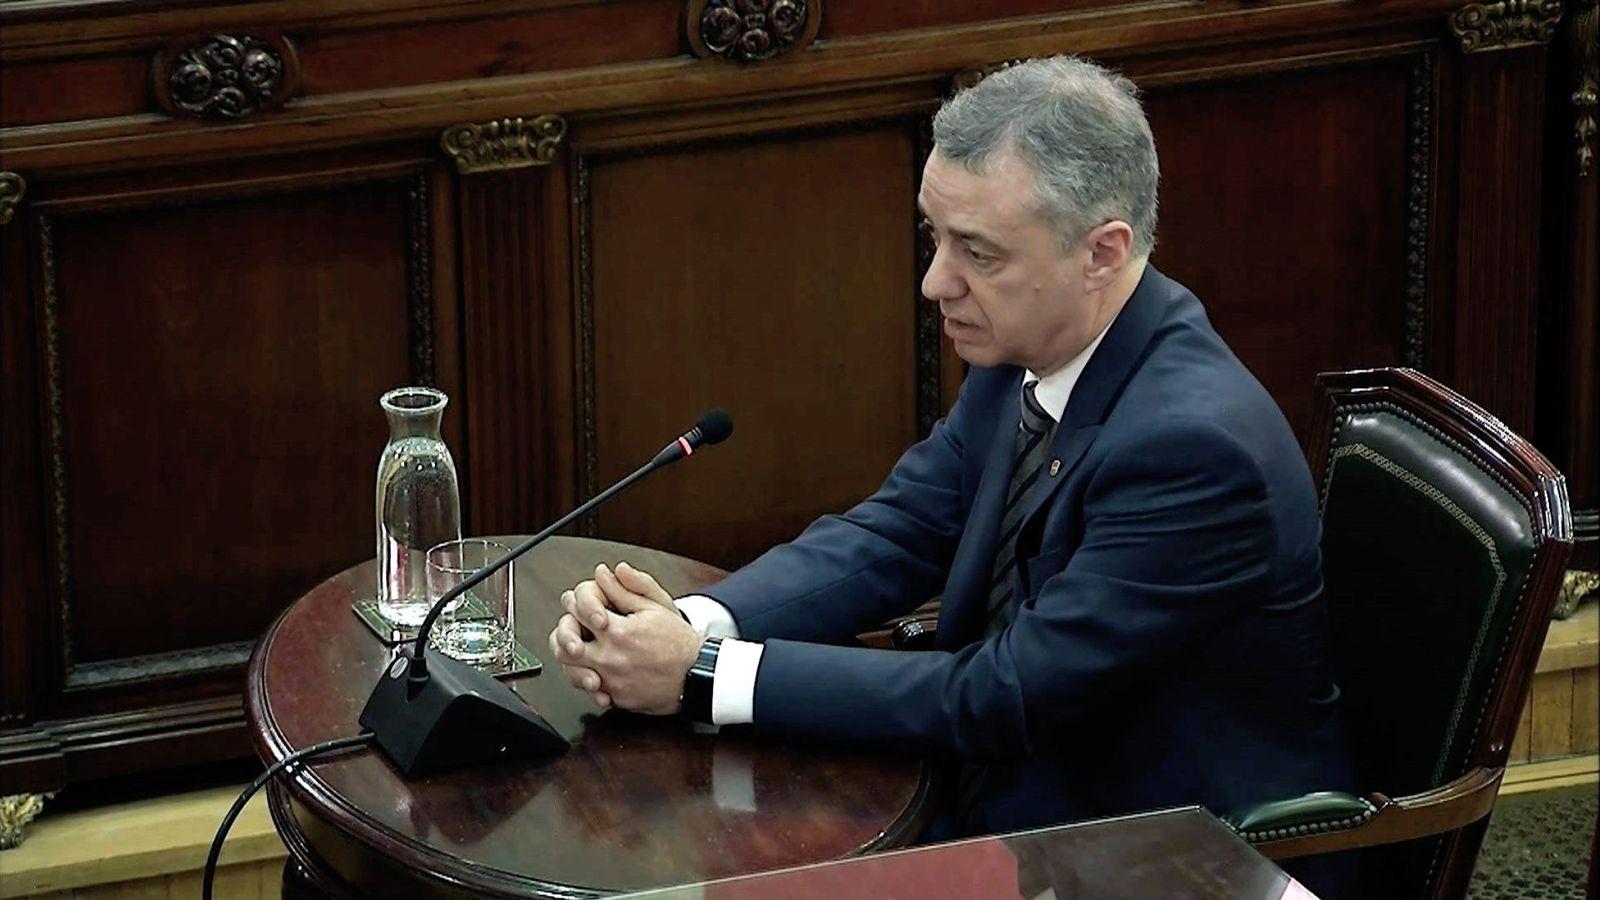 Foto: Captura de la señal institucional del Tribunal Supremo del lendakari Iñigo Urkullu. (EFE)